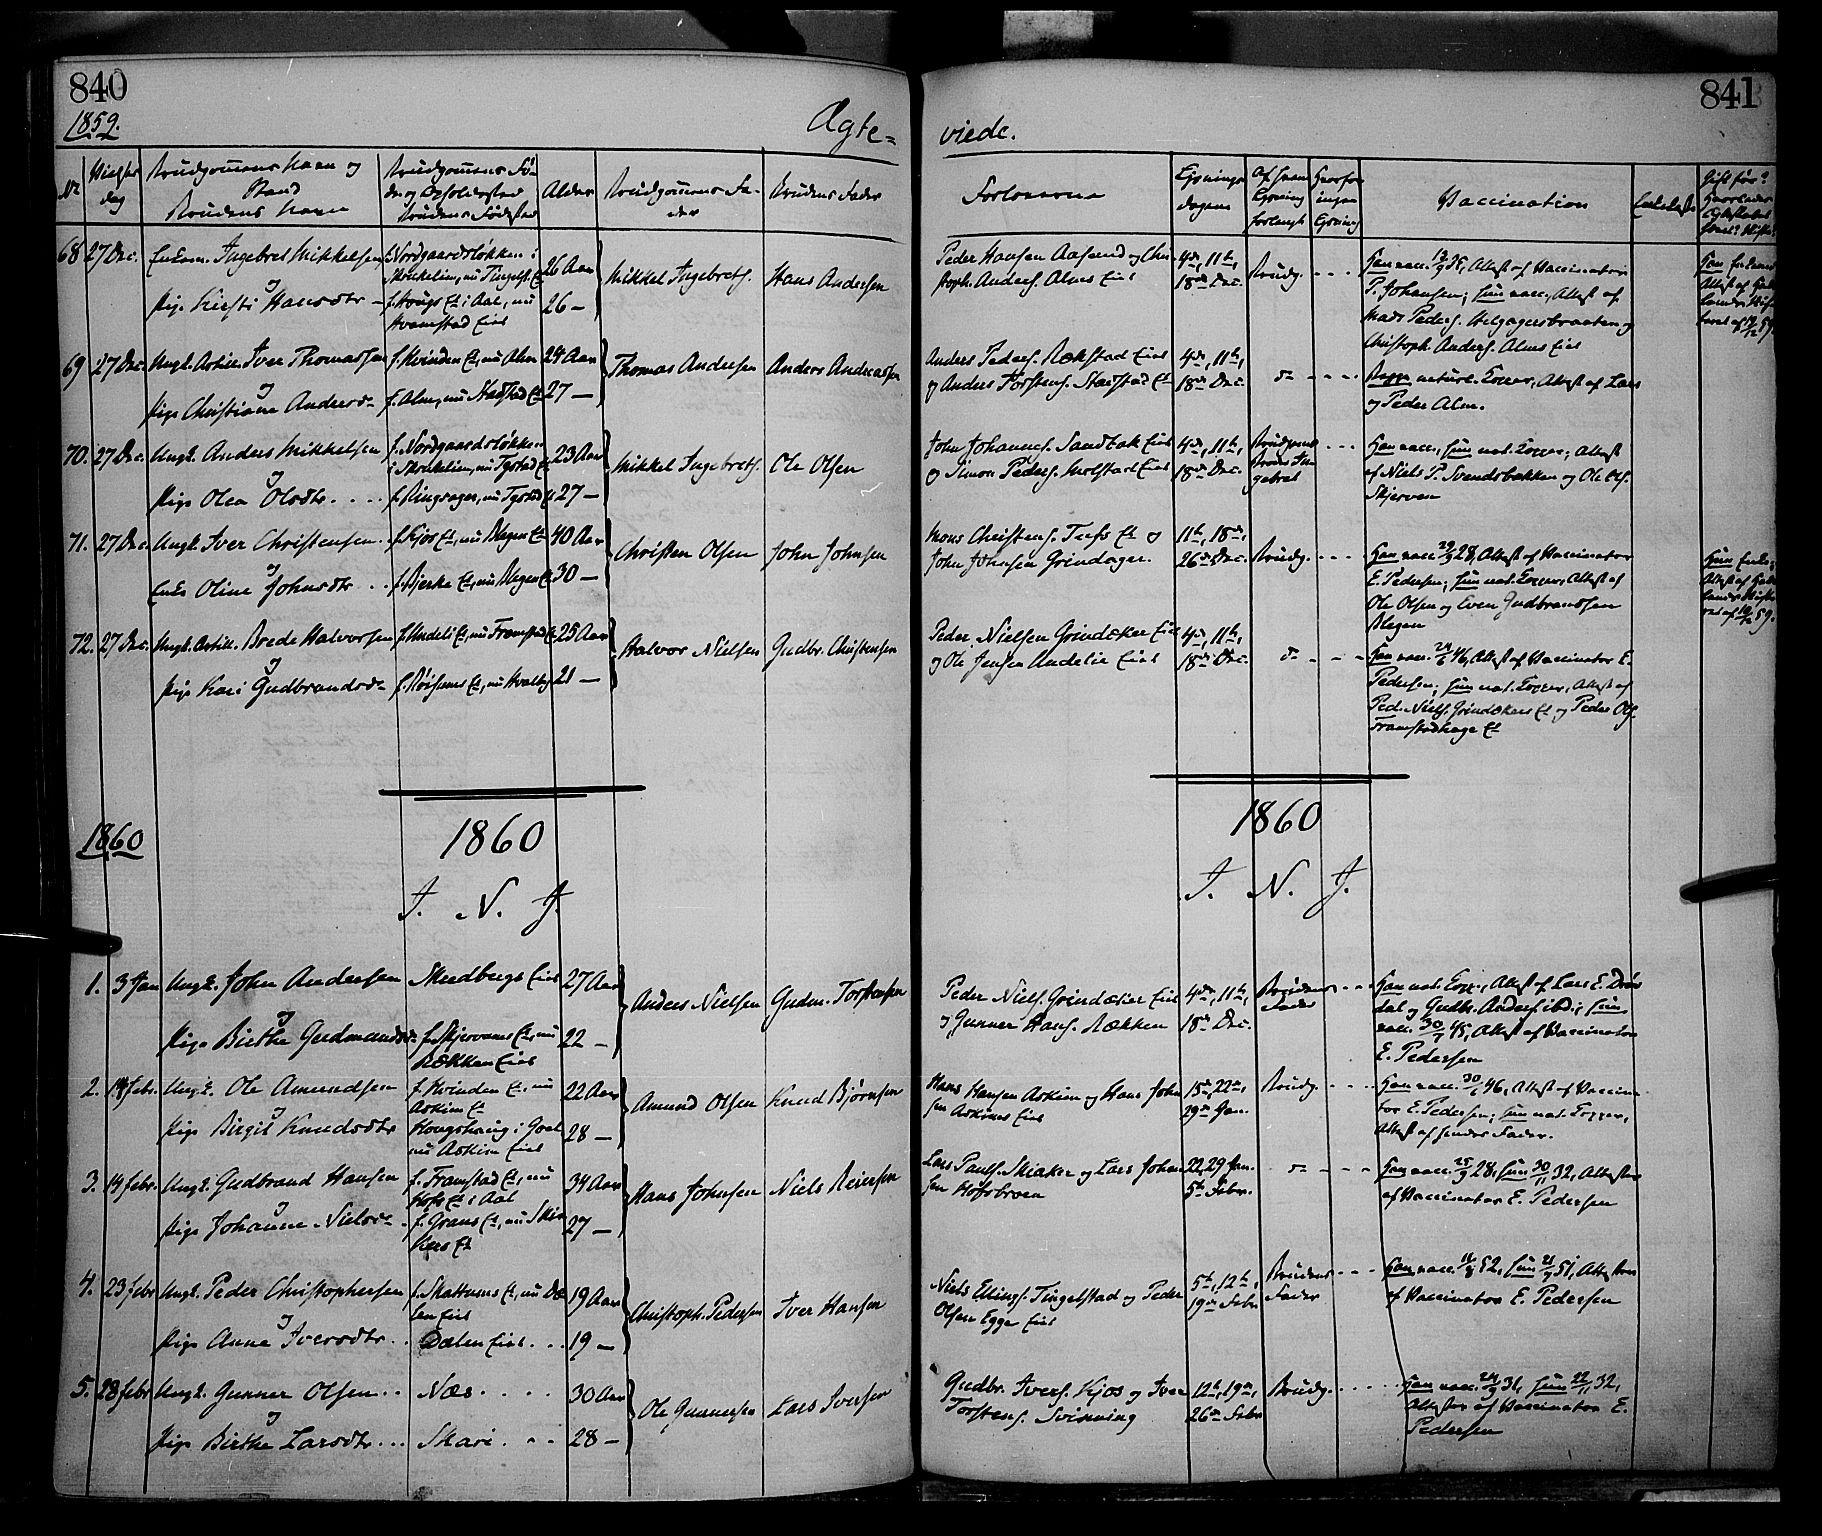 SAH, Gran prestekontor, Ministerialbok nr. 12, 1856-1874, s. 840-841